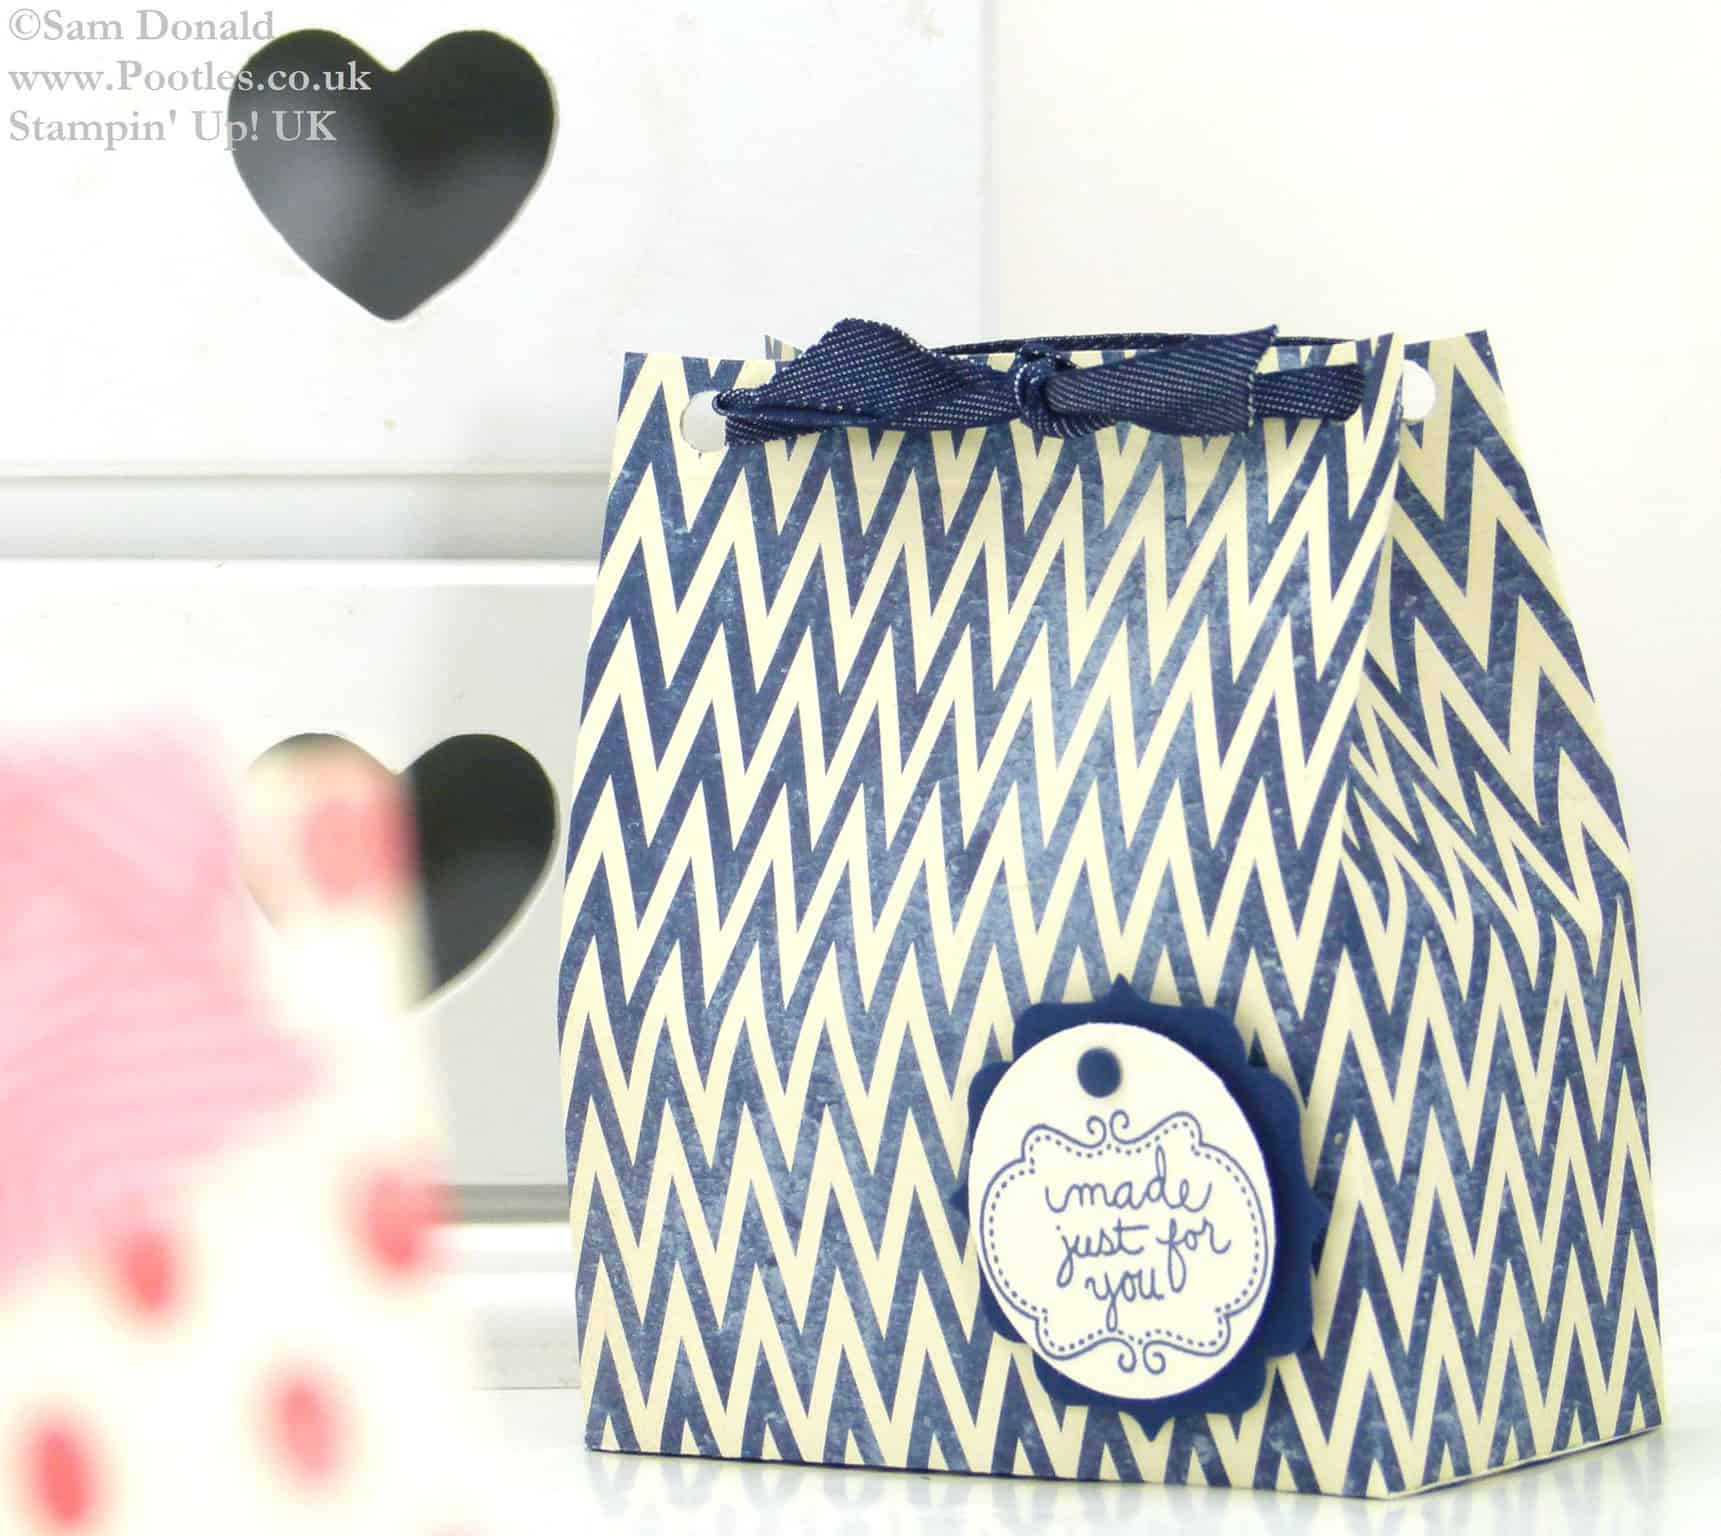 POOTLES Stampin Up UK Soap Gift Treat Bag Tutorial 2